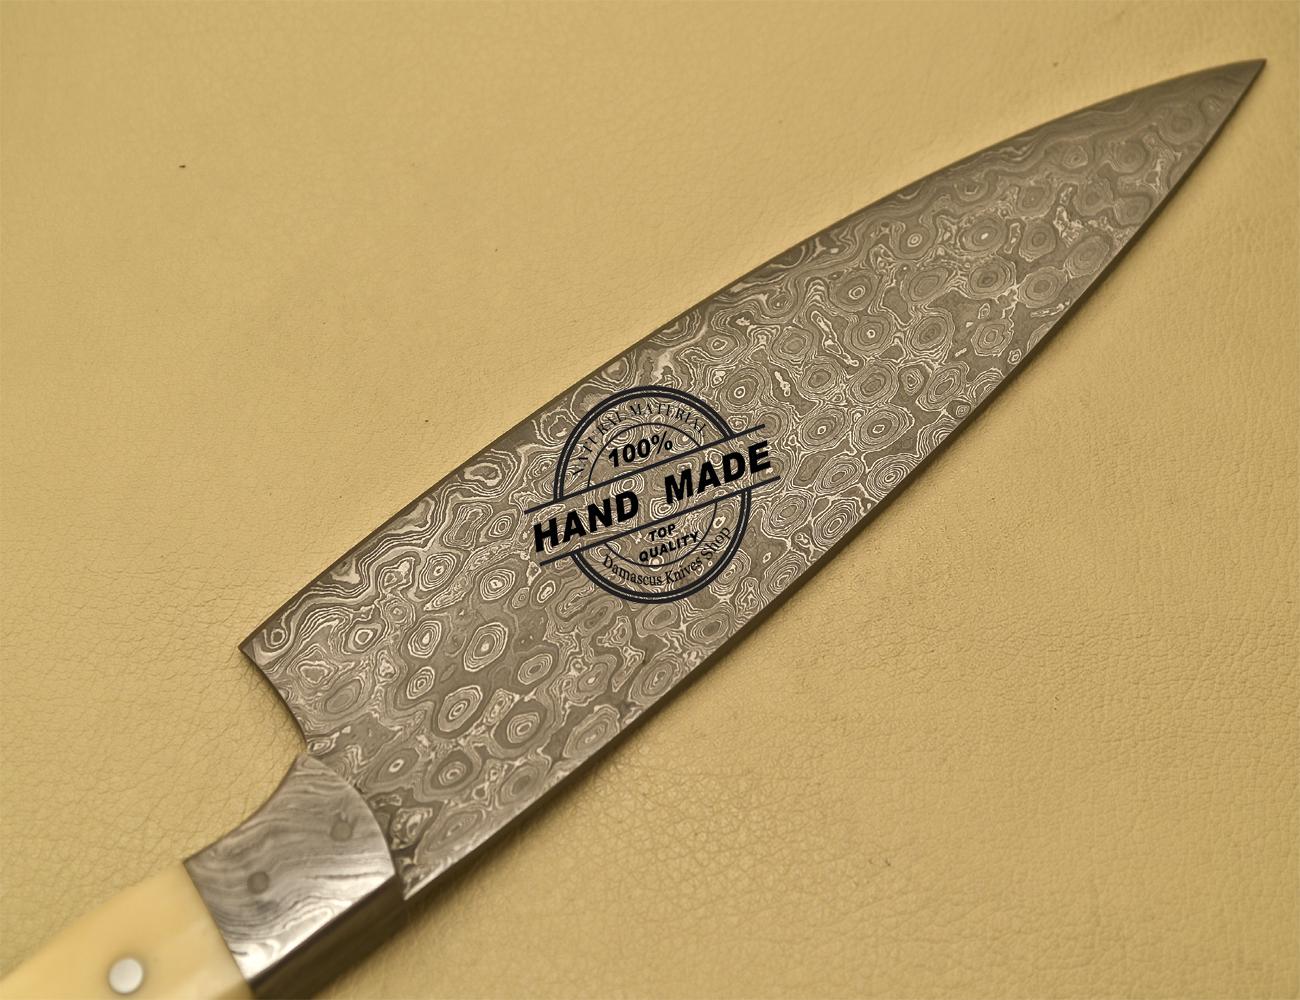 damascus kitchen knife custom handmade damascus steel kitchen chef knife with bone handle 904. Black Bedroom Furniture Sets. Home Design Ideas